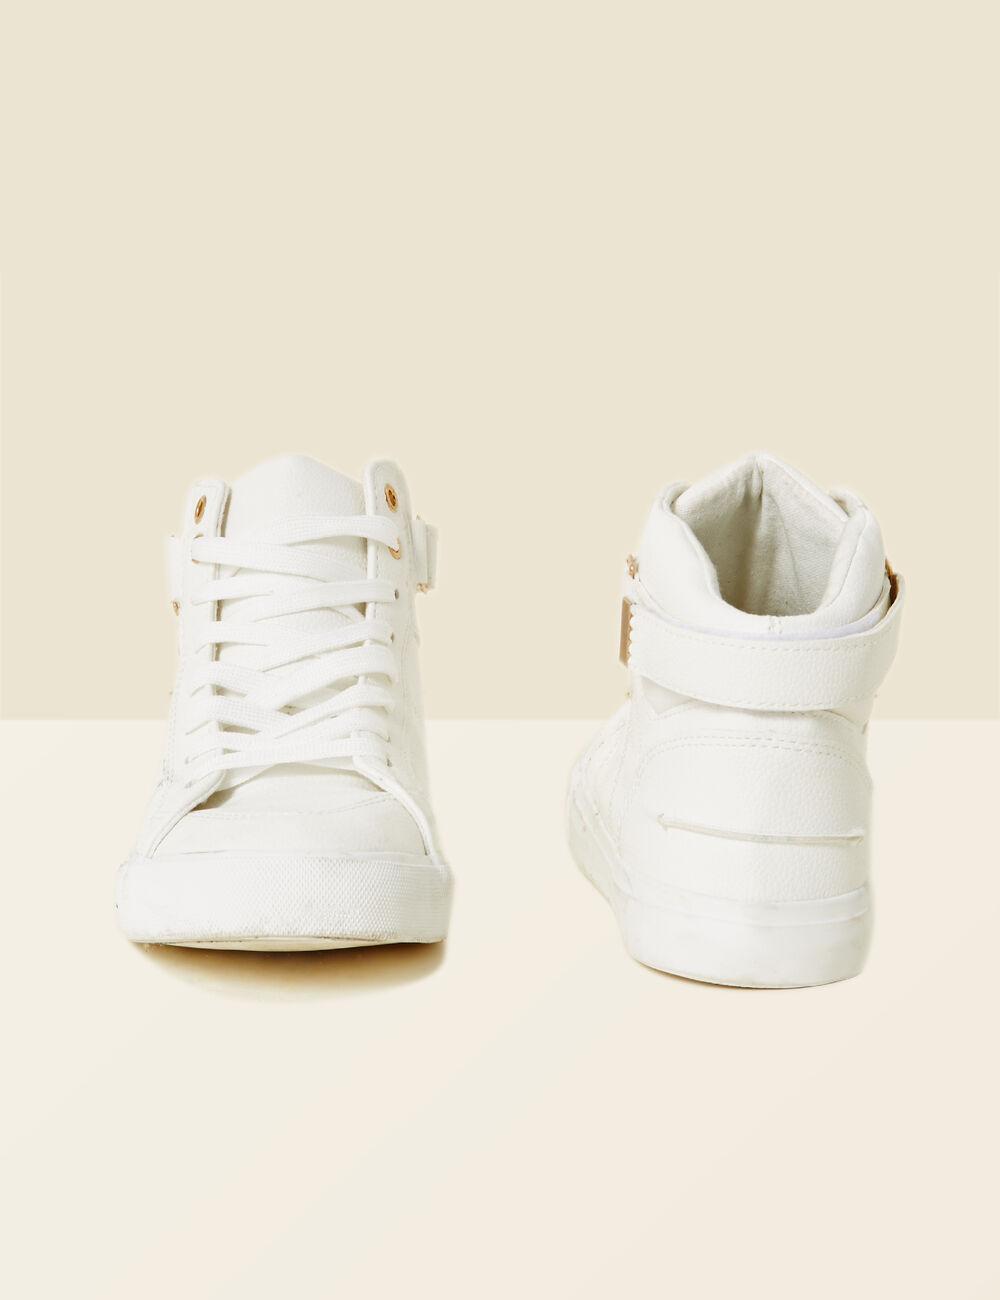 Assez Baskets montantes blanches femme • Jennyfer SO68 e817b37ca5b1